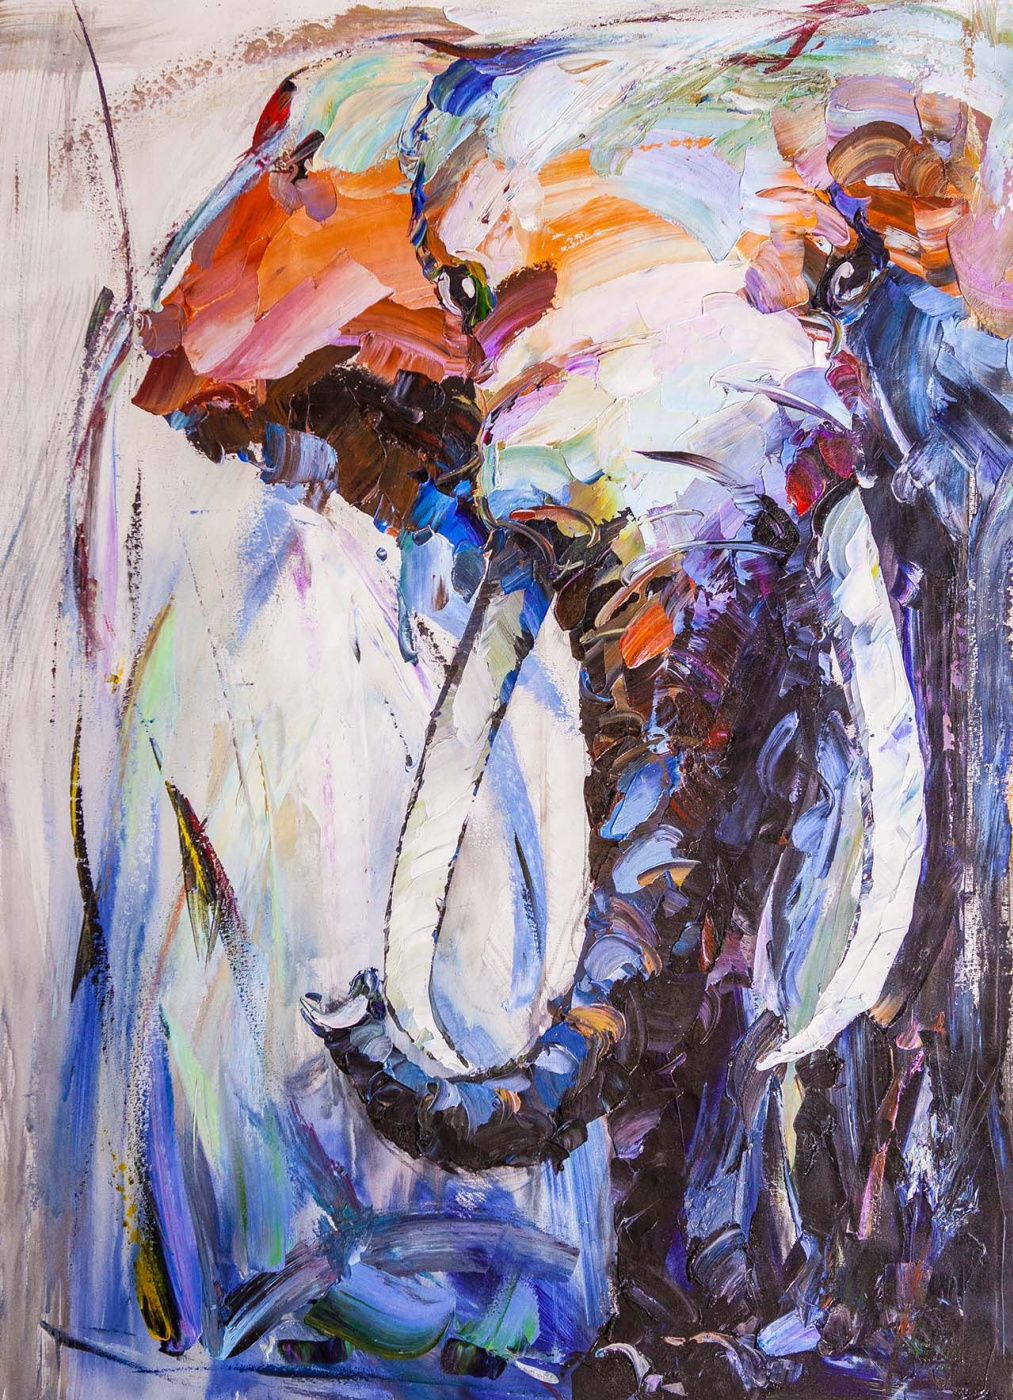 Jose Rodriguez. Theory of Elephants N3